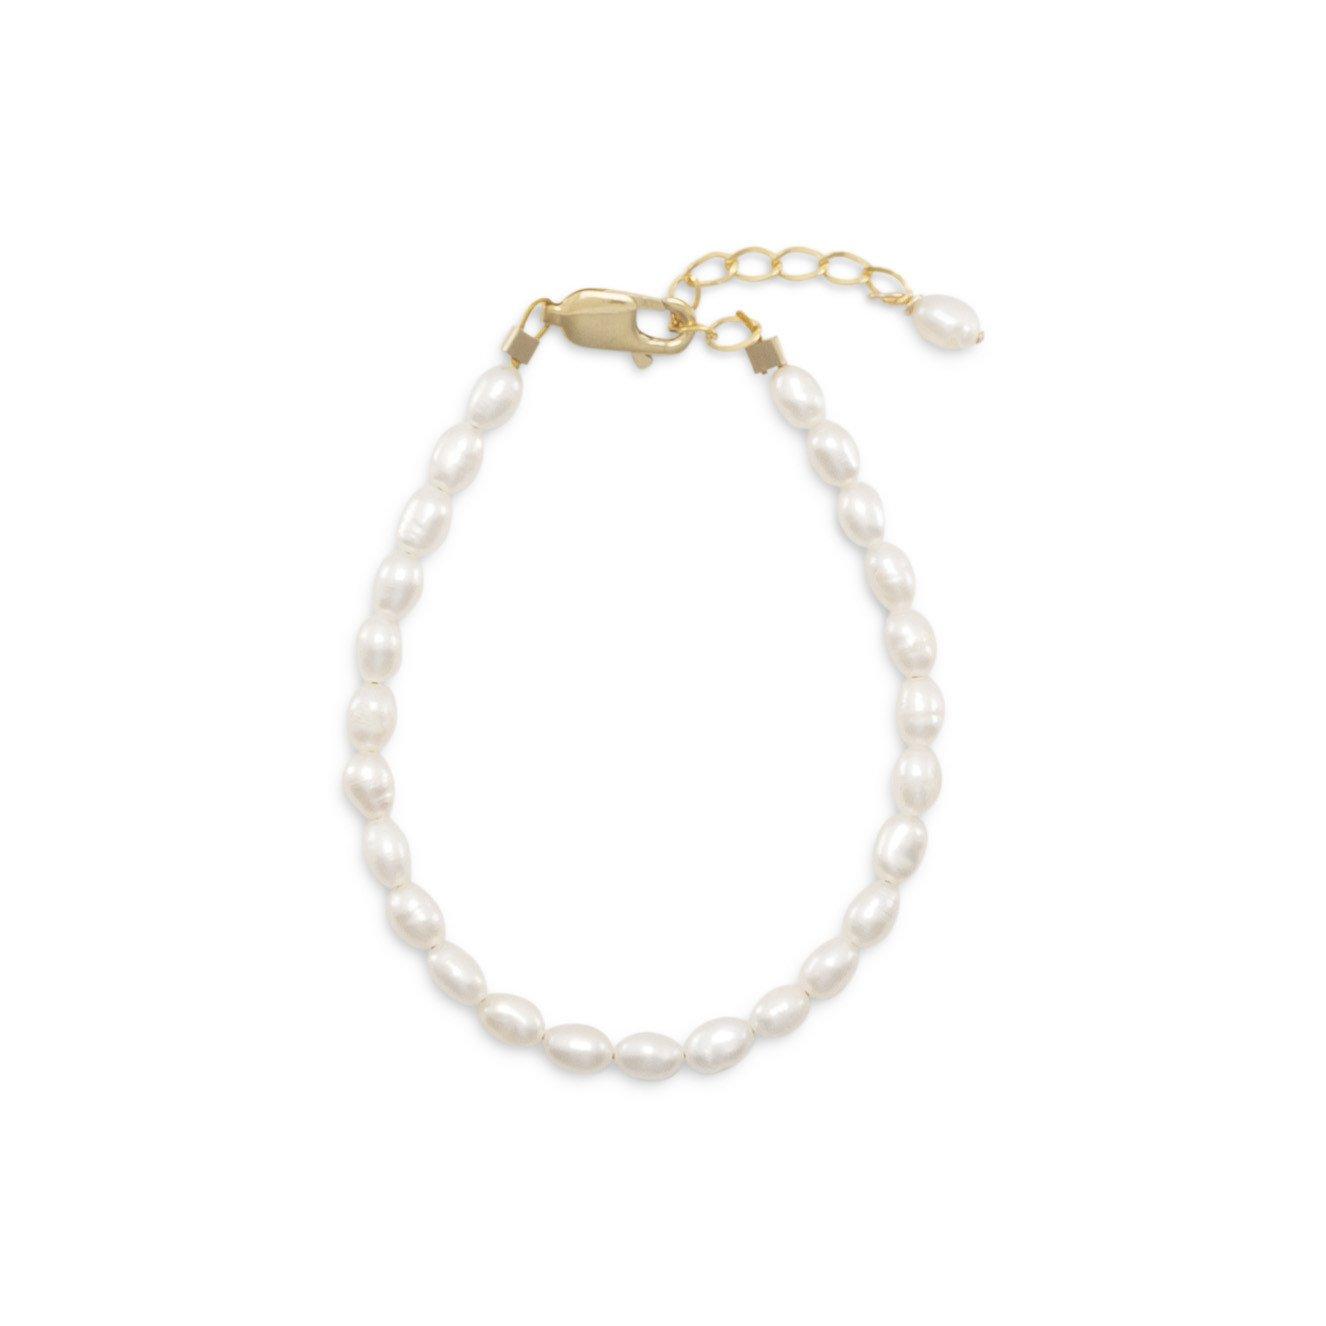 5″+1″ 14/20 Gold Filled Cultured Freshwater Rice Pearl Bracelet